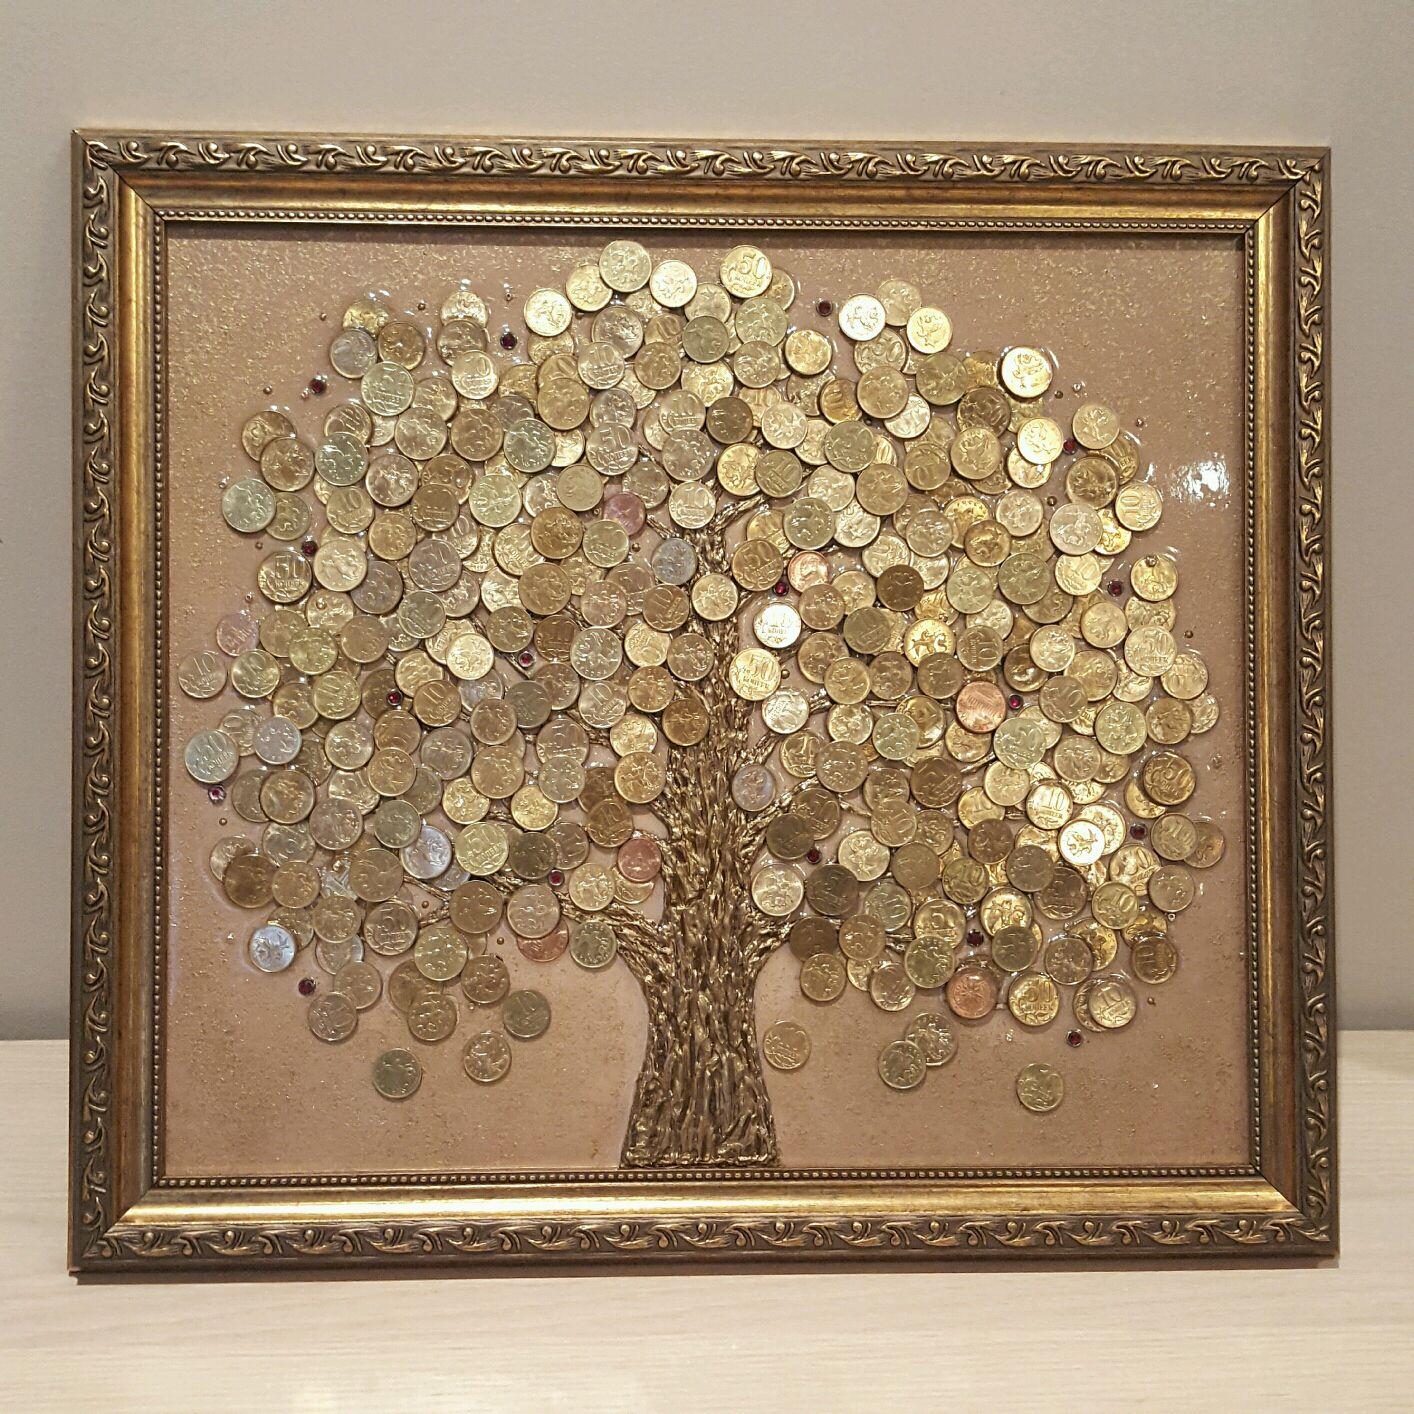 Картина денежное дерево из монет своими руками мастер 48